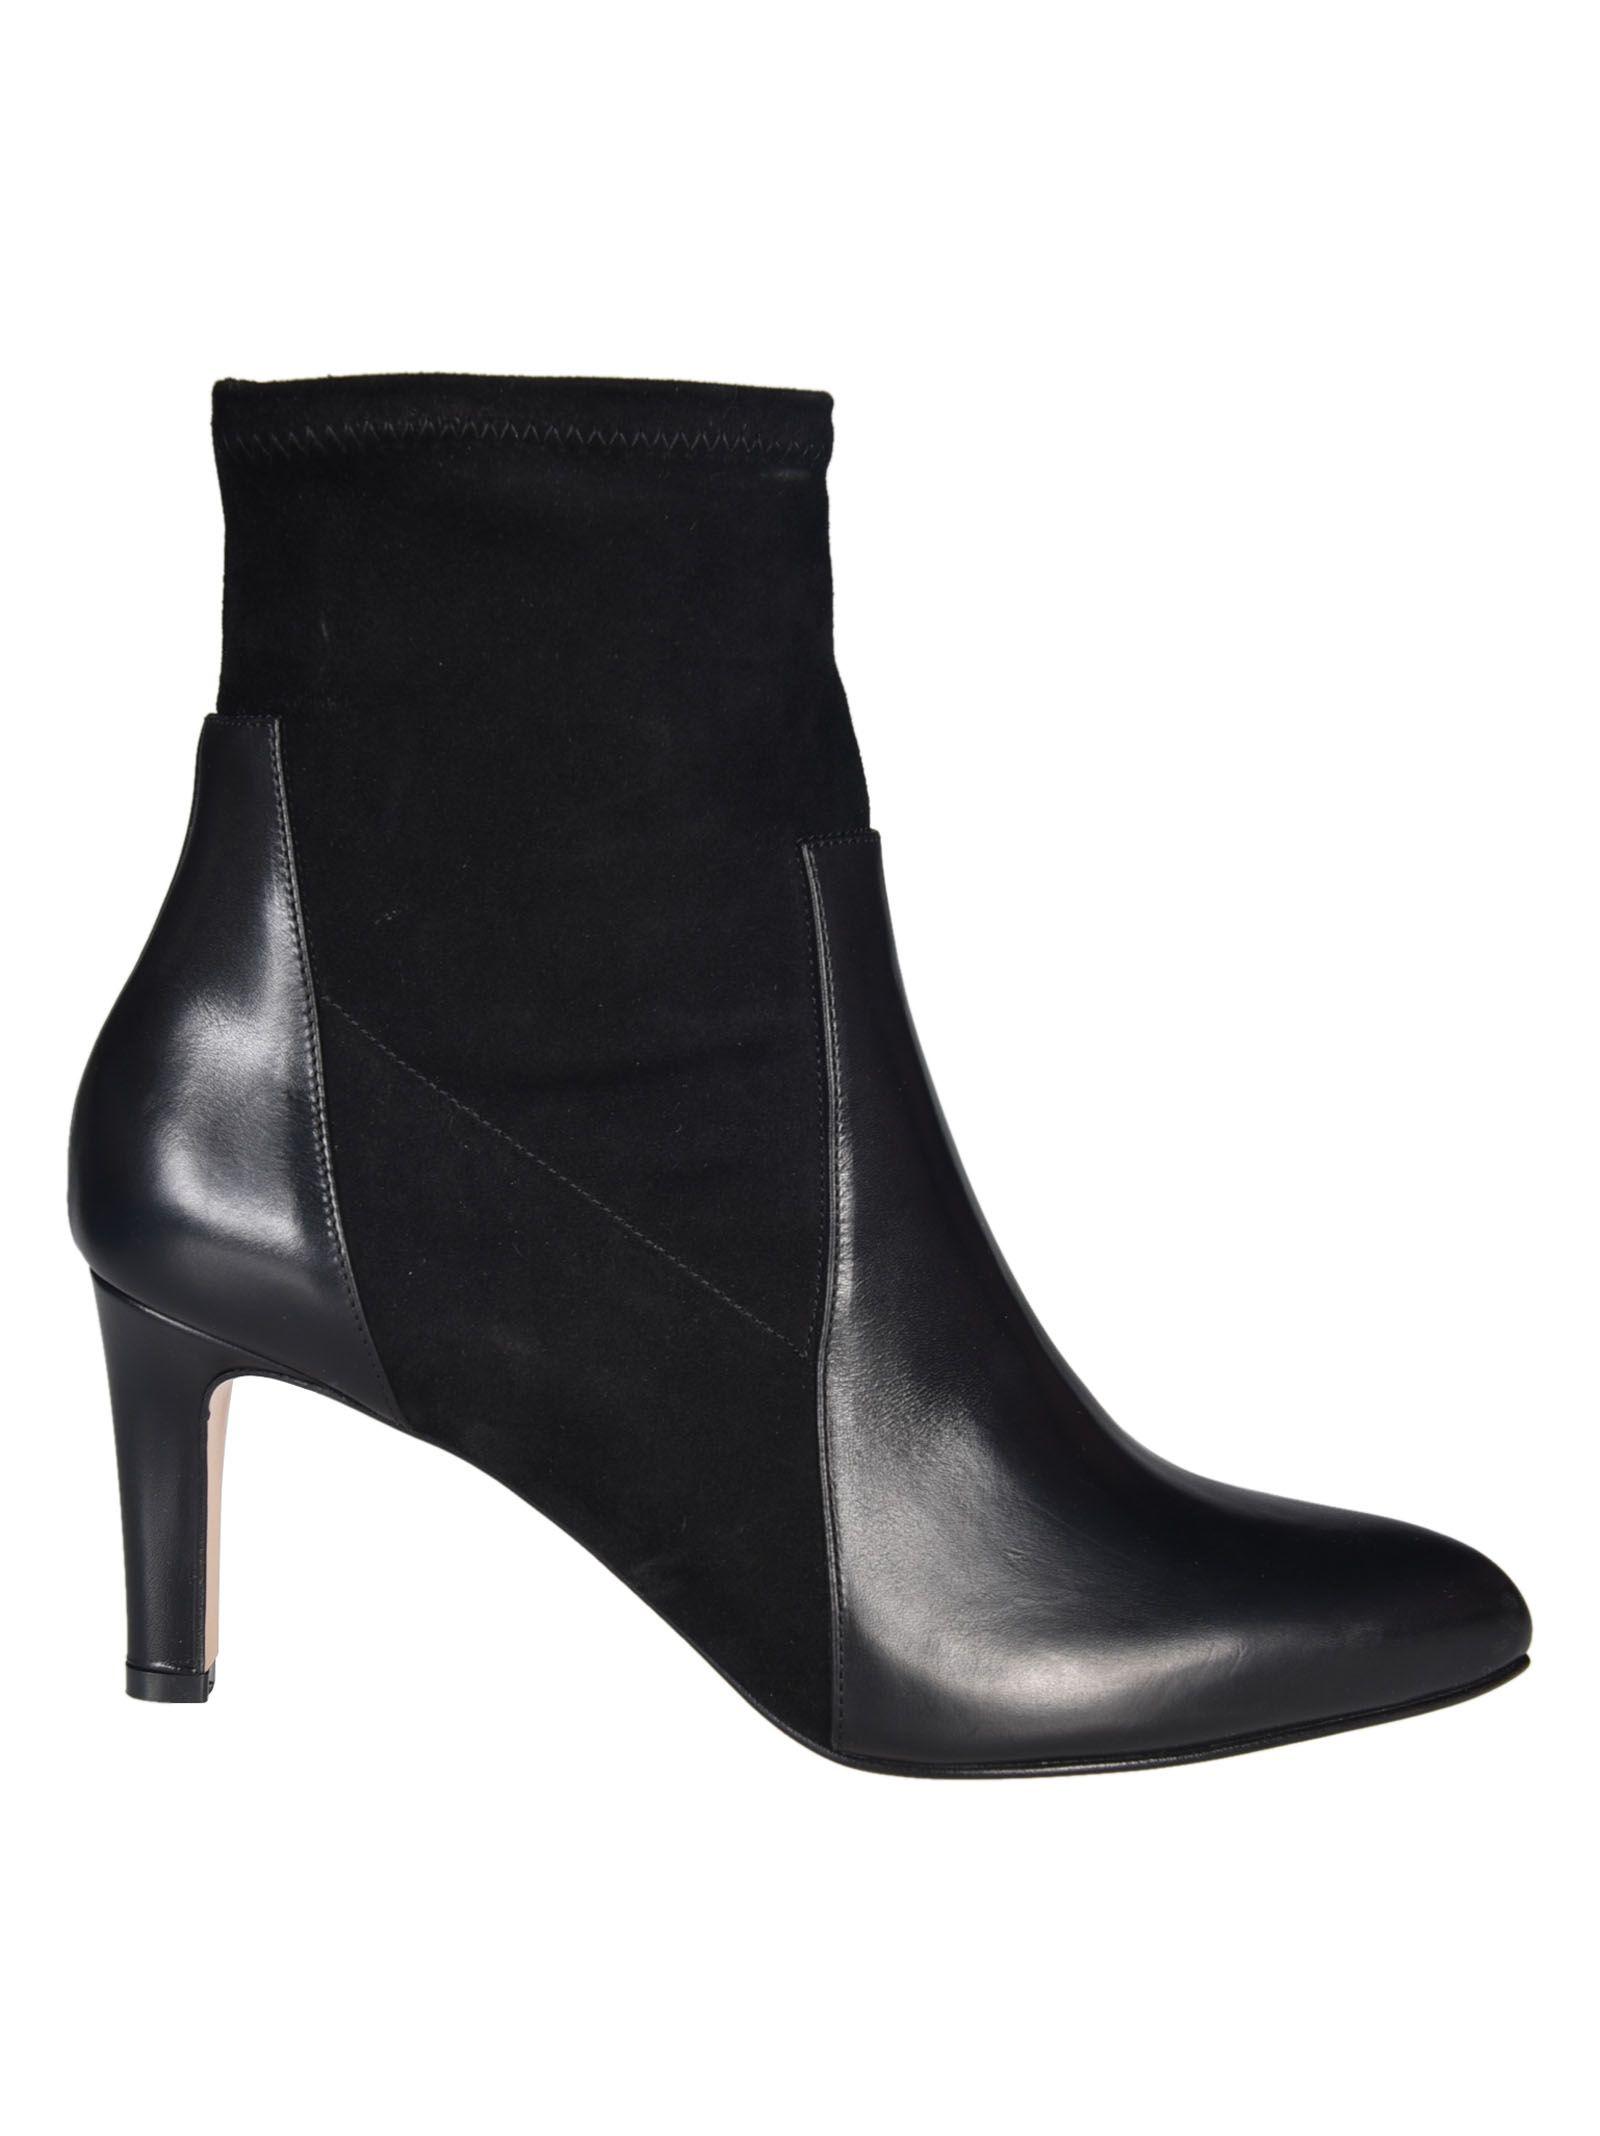 Antonio Barbato Pointed Boots